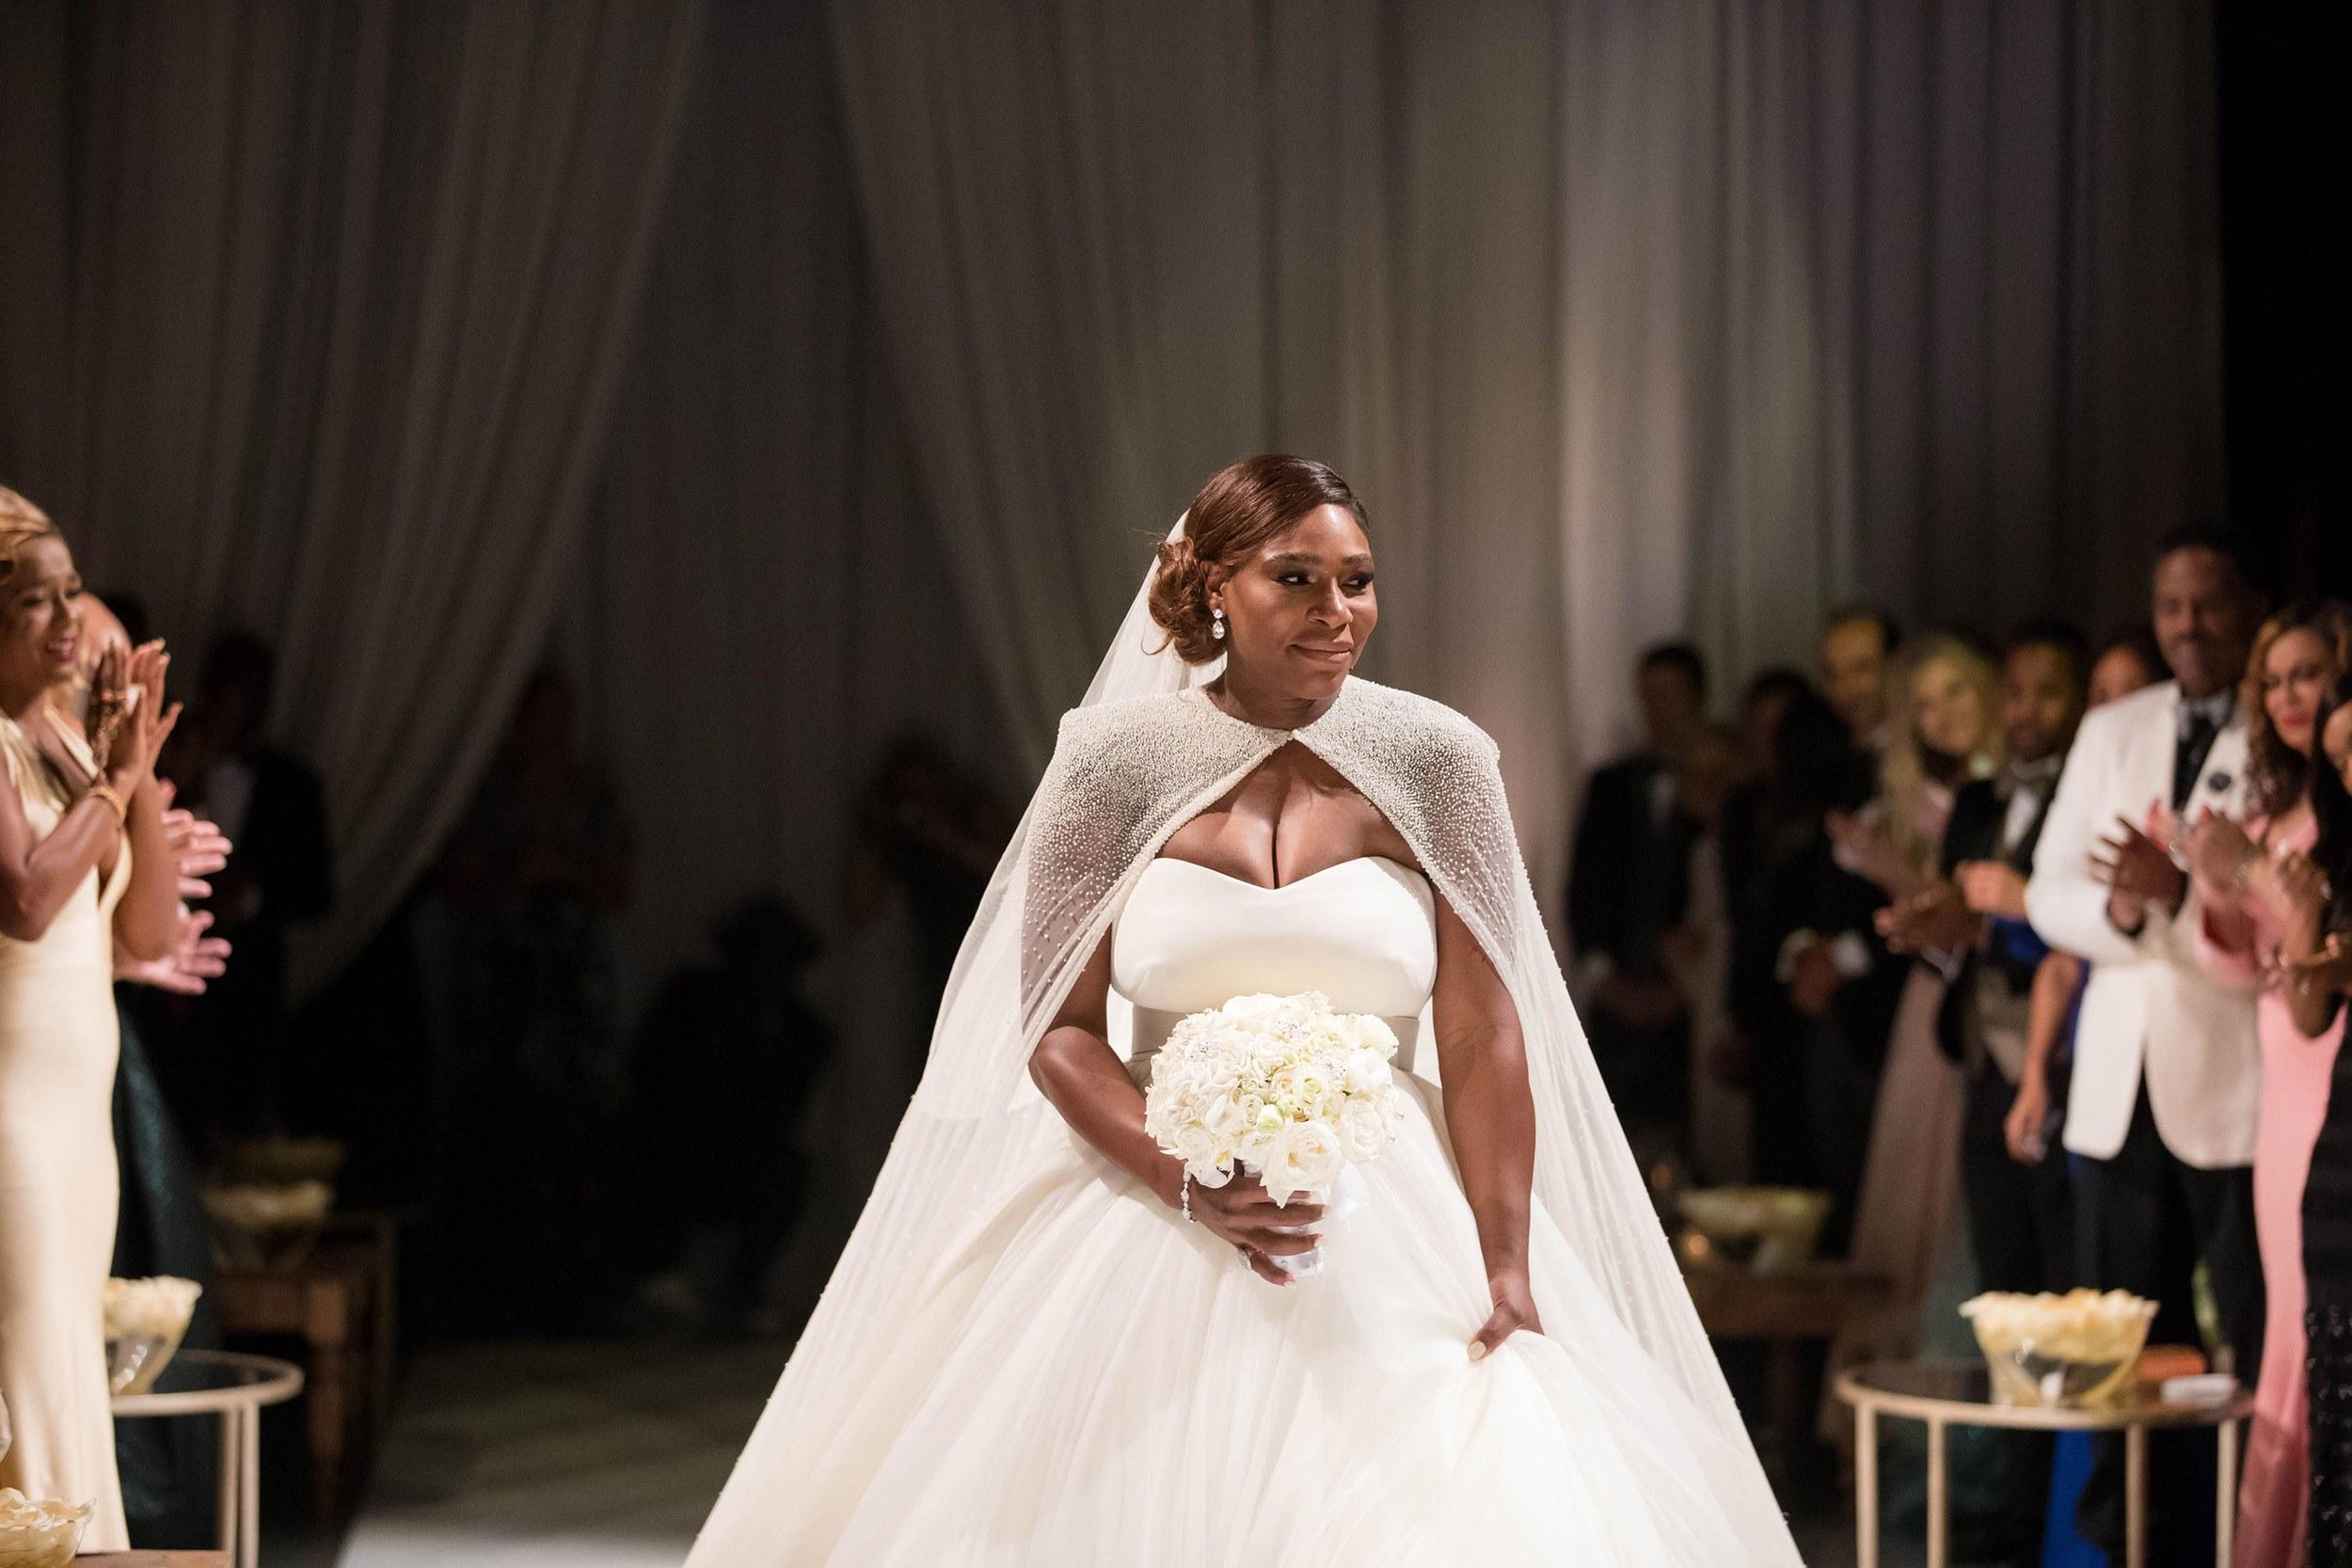 Les photos du mariage féérique de Serena Williams